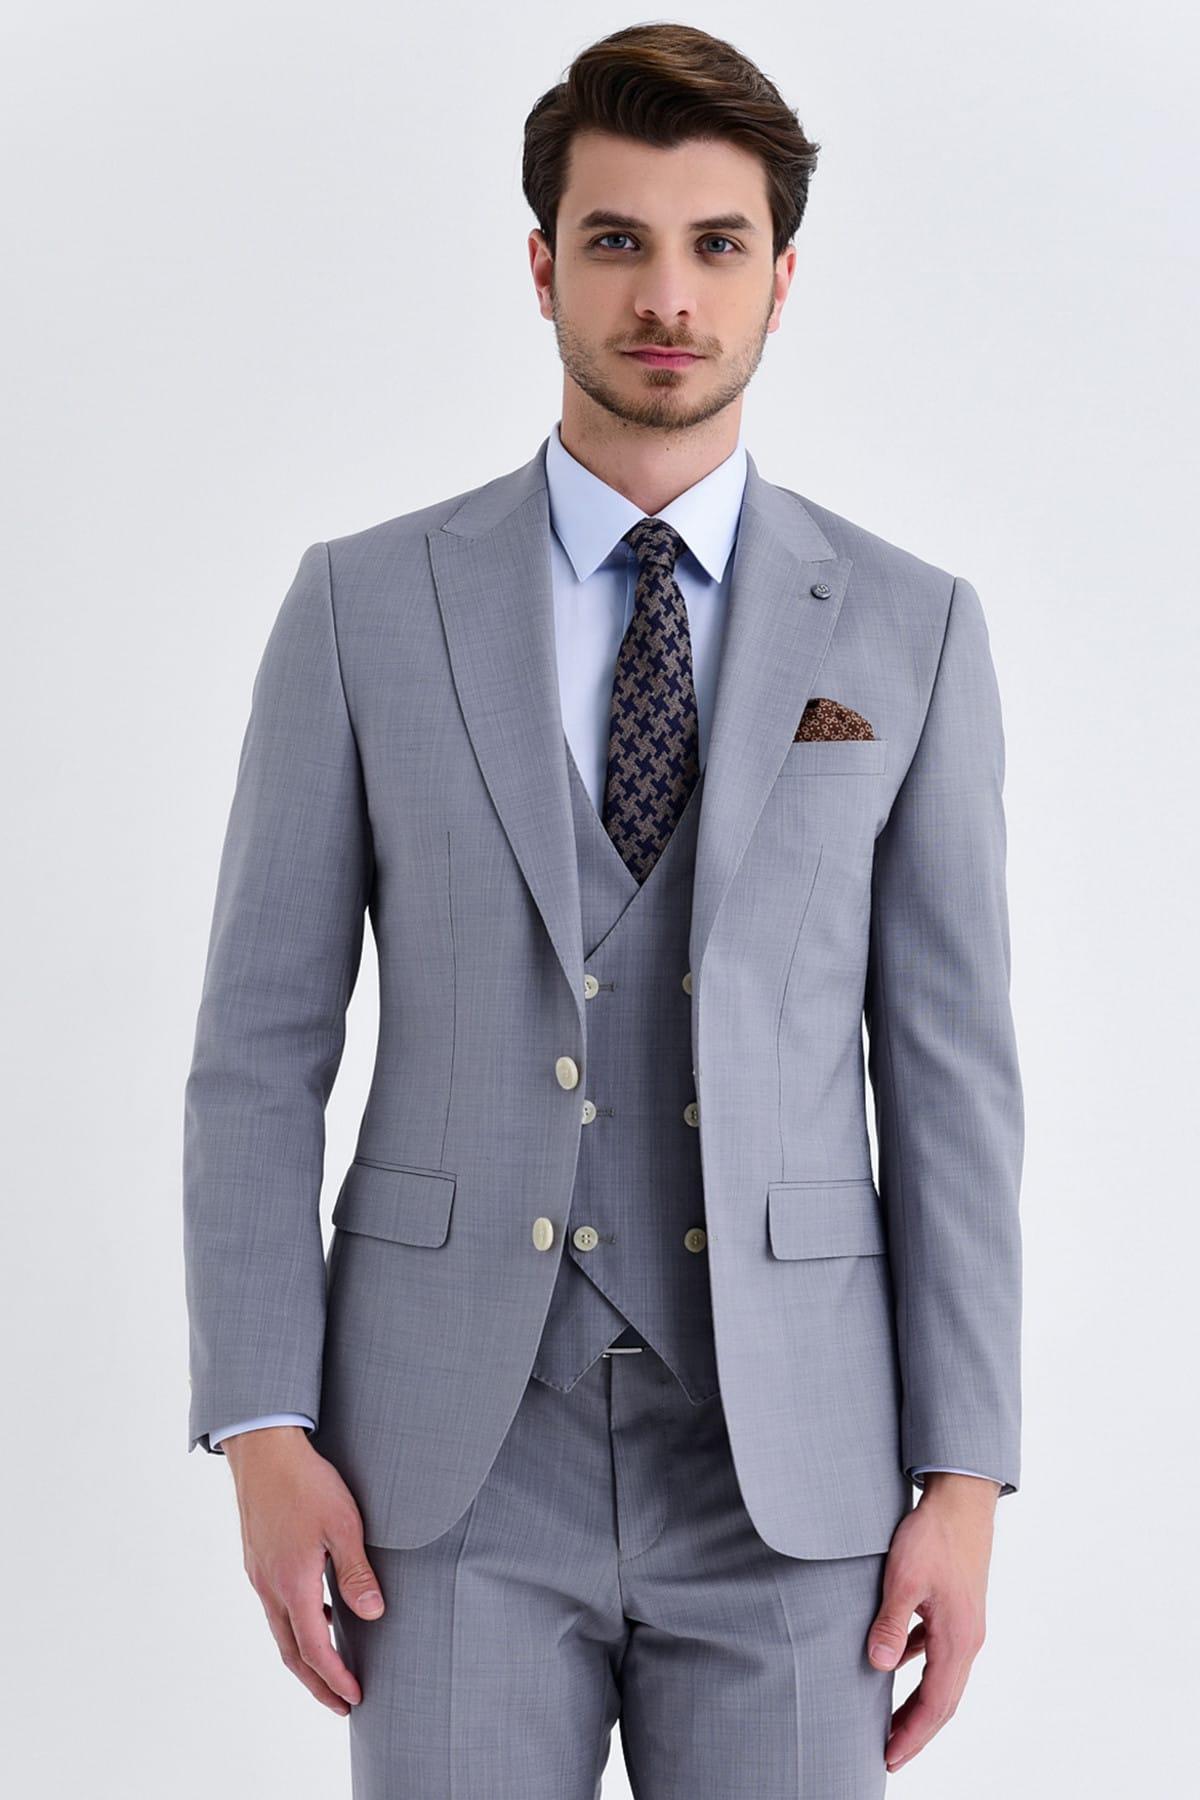 Hatemoğlu Yelekli Slim Fit Gri Takım Elbise 33201319C021